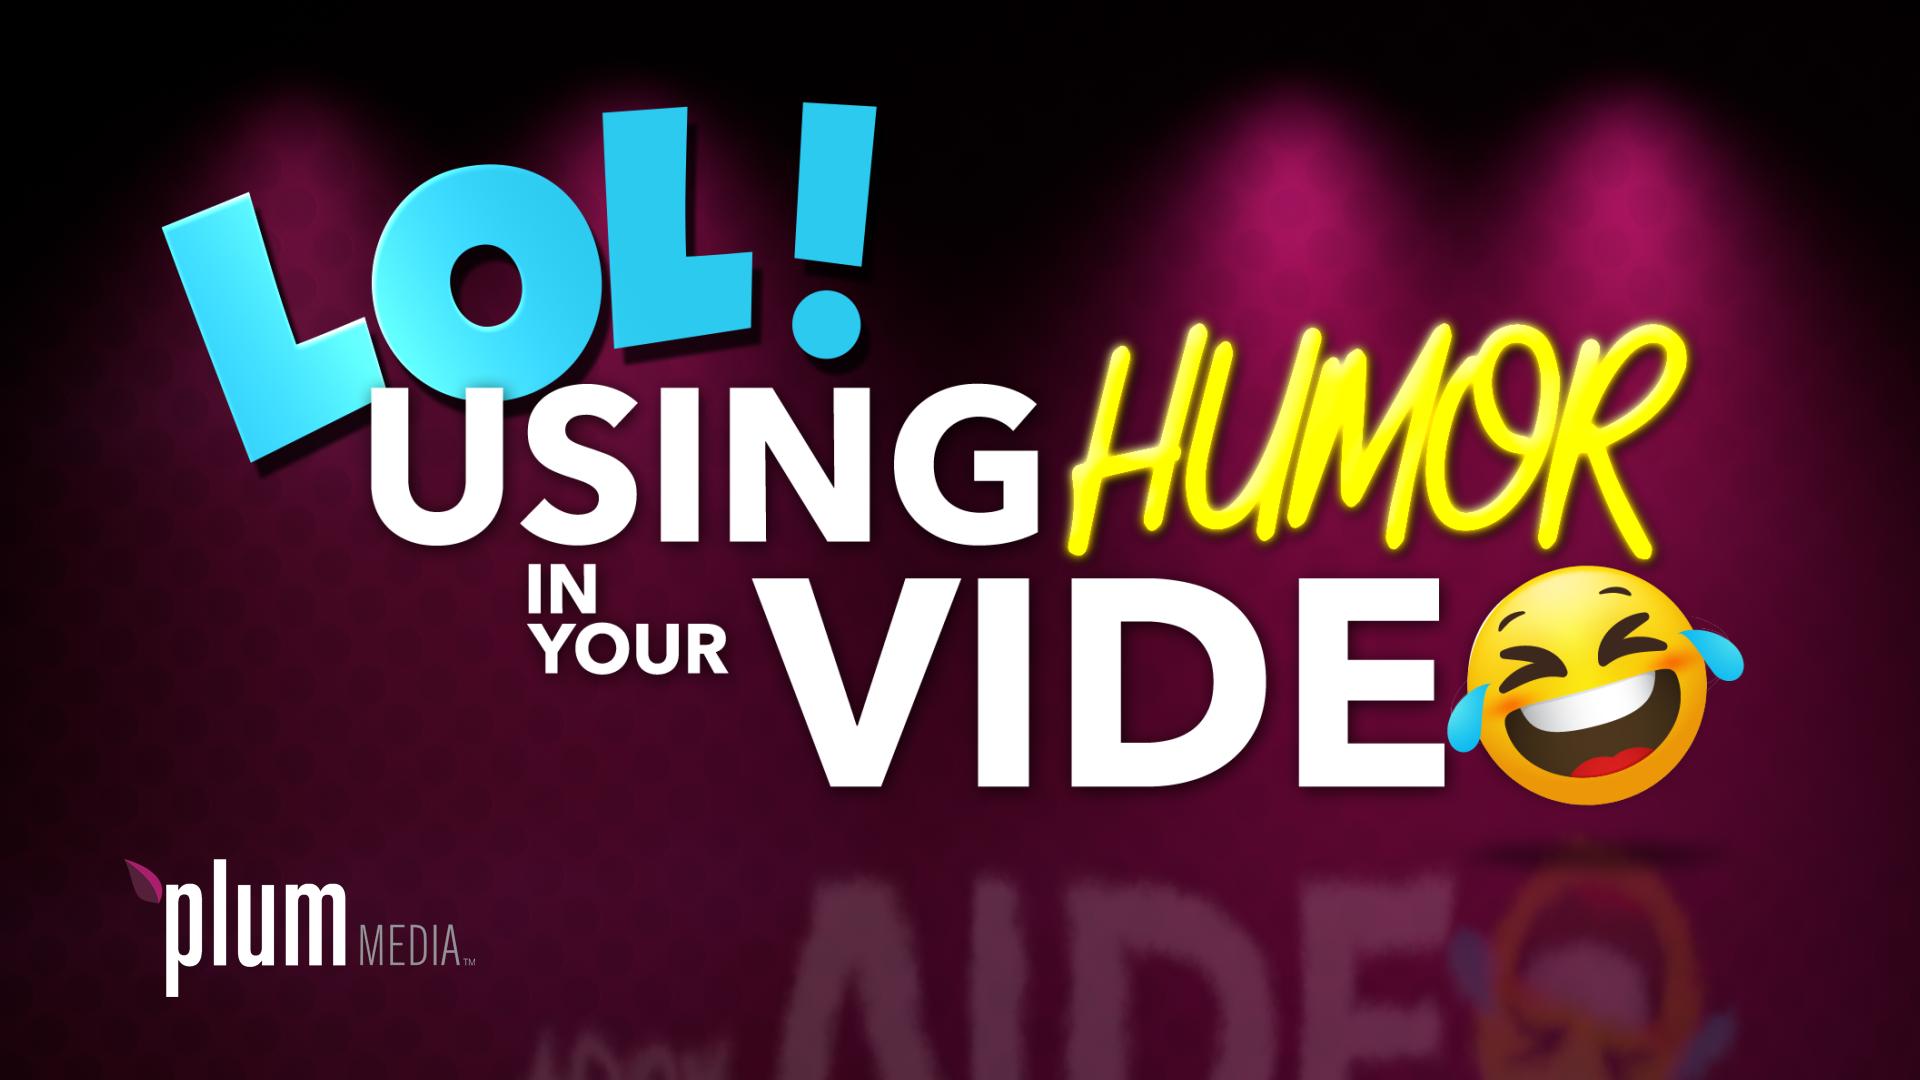 LOL Using Humor in Video